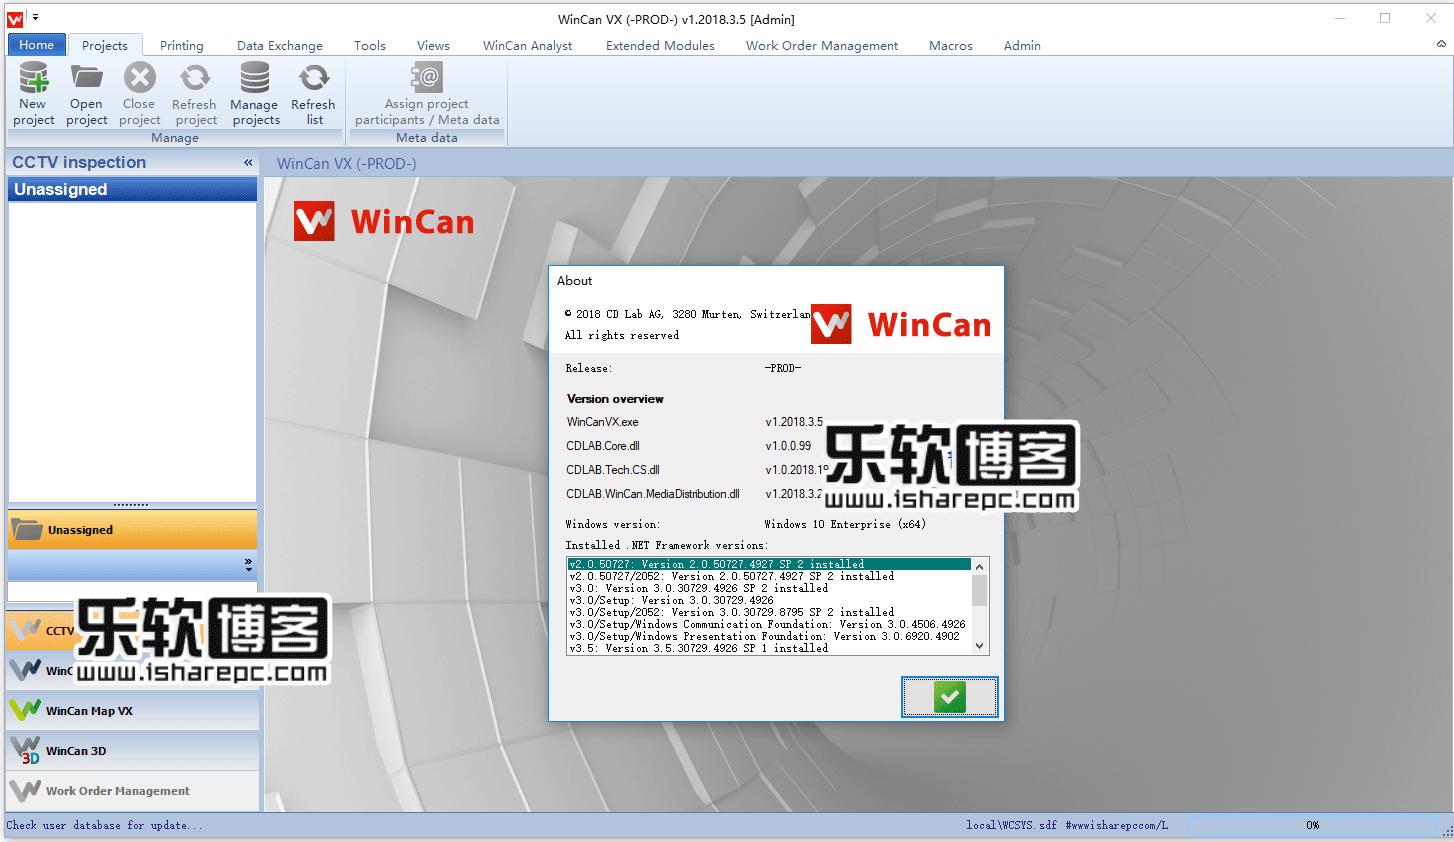 WinCan VX 1.2018.3.5破解版